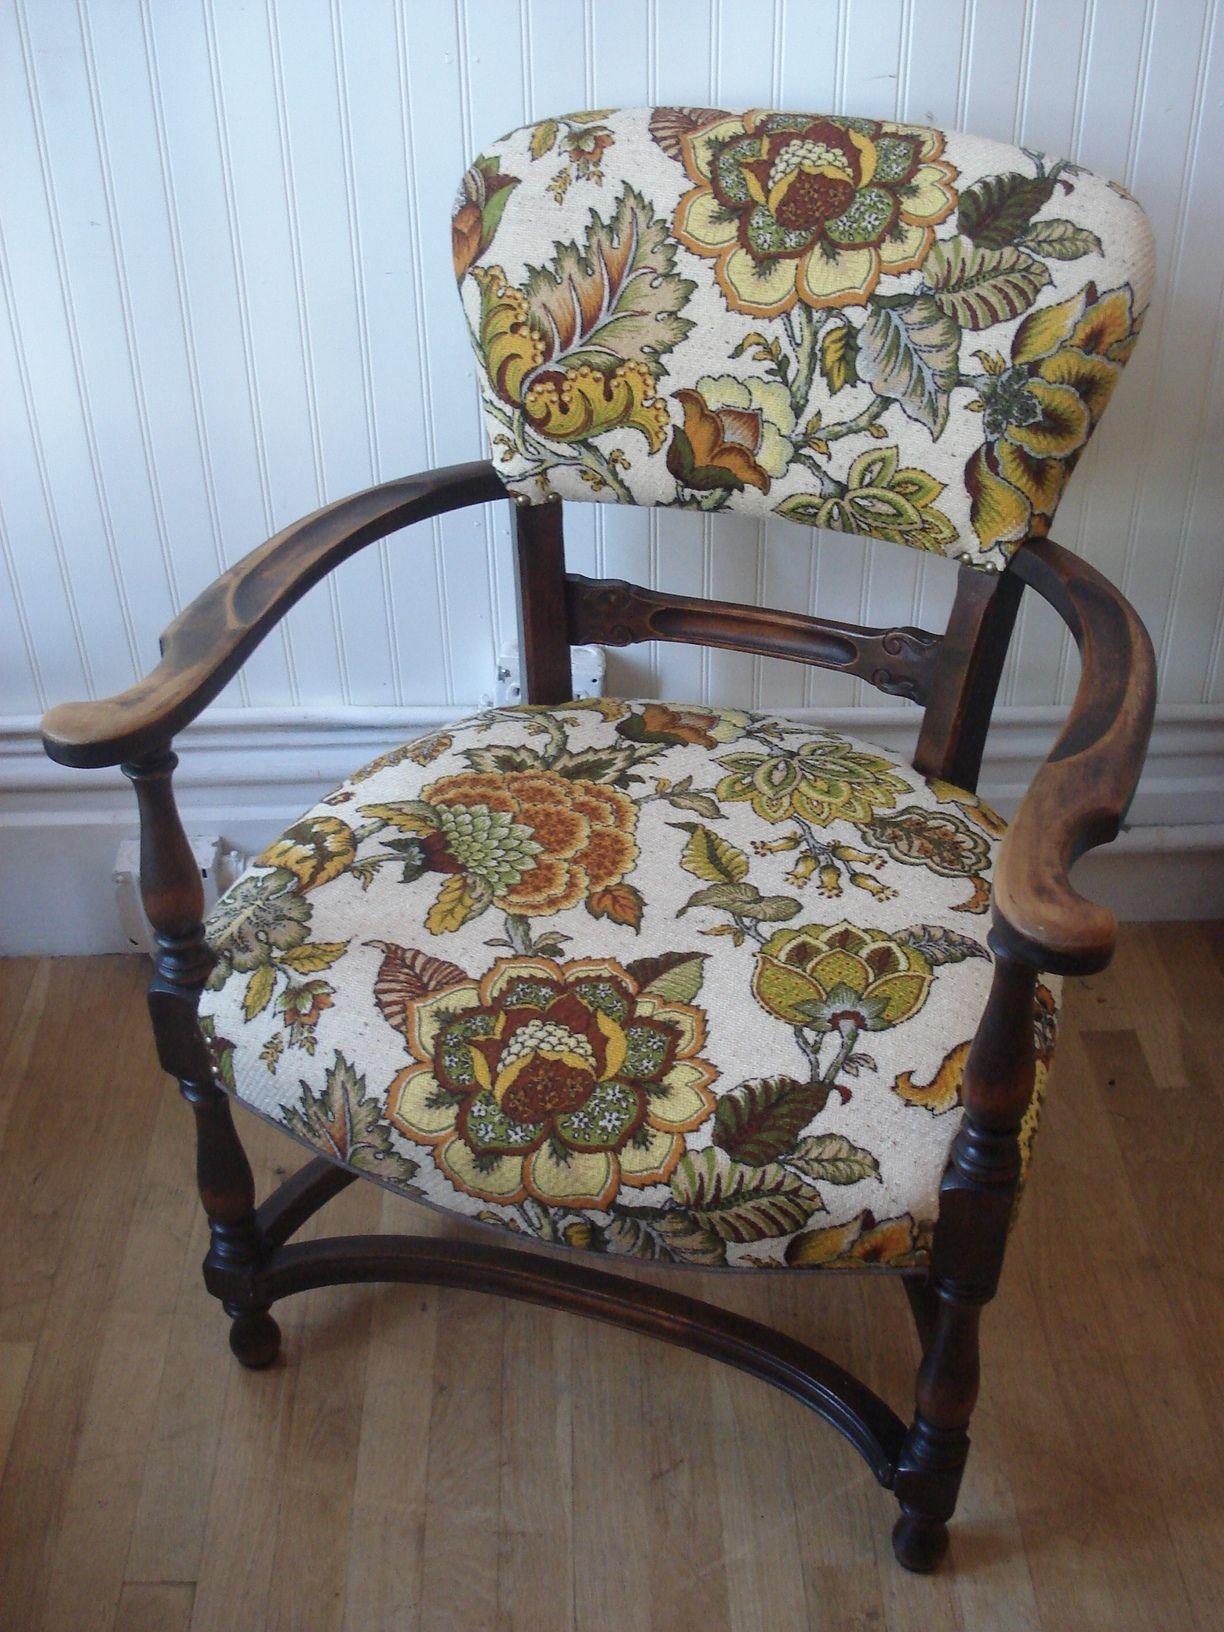 Google Image Result for http://swanketyswank.com/wp-content/uploads/2010/10/floral-burlap-chair.jpg